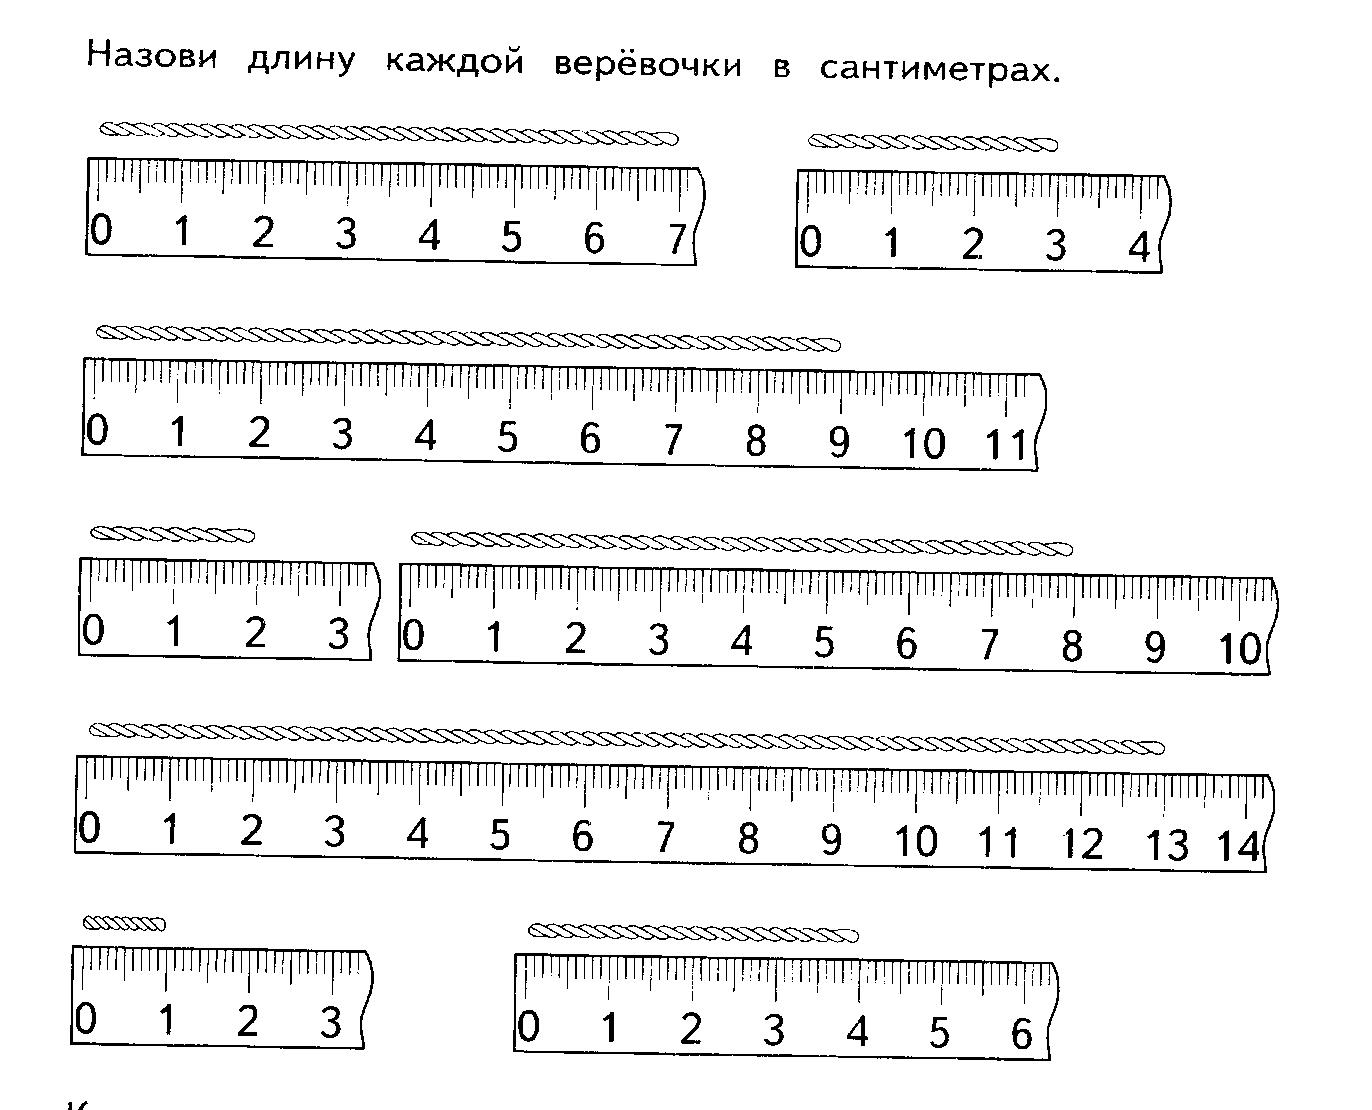 C:\Users\татьяна\Pictures\2012-10-19\IMAGE0034 - копия.tif